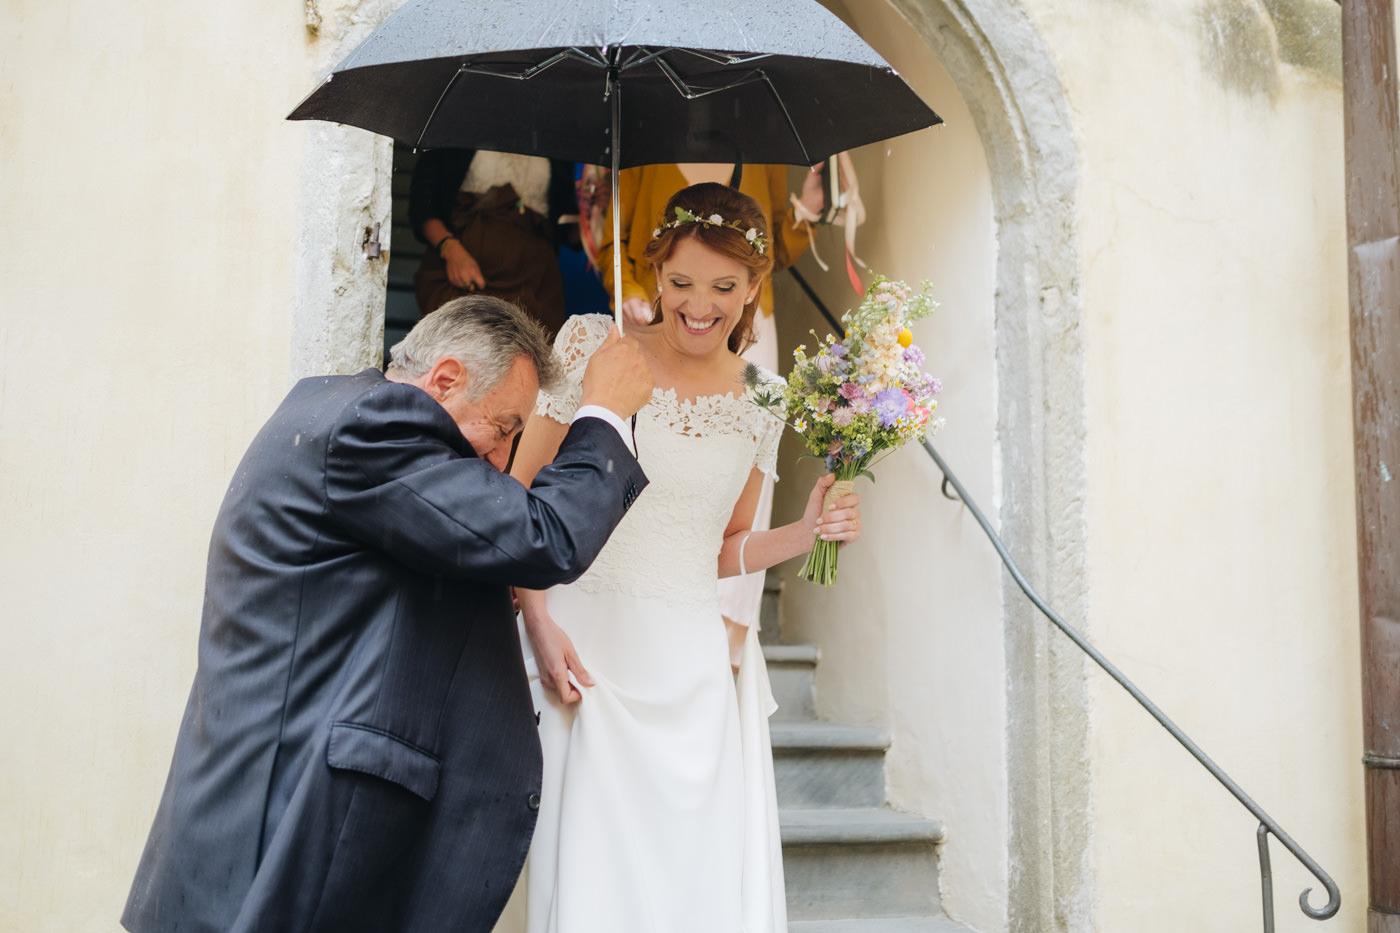 matrimoni_all_italiana_fotografo_matrimonio_toscana-23.jpg